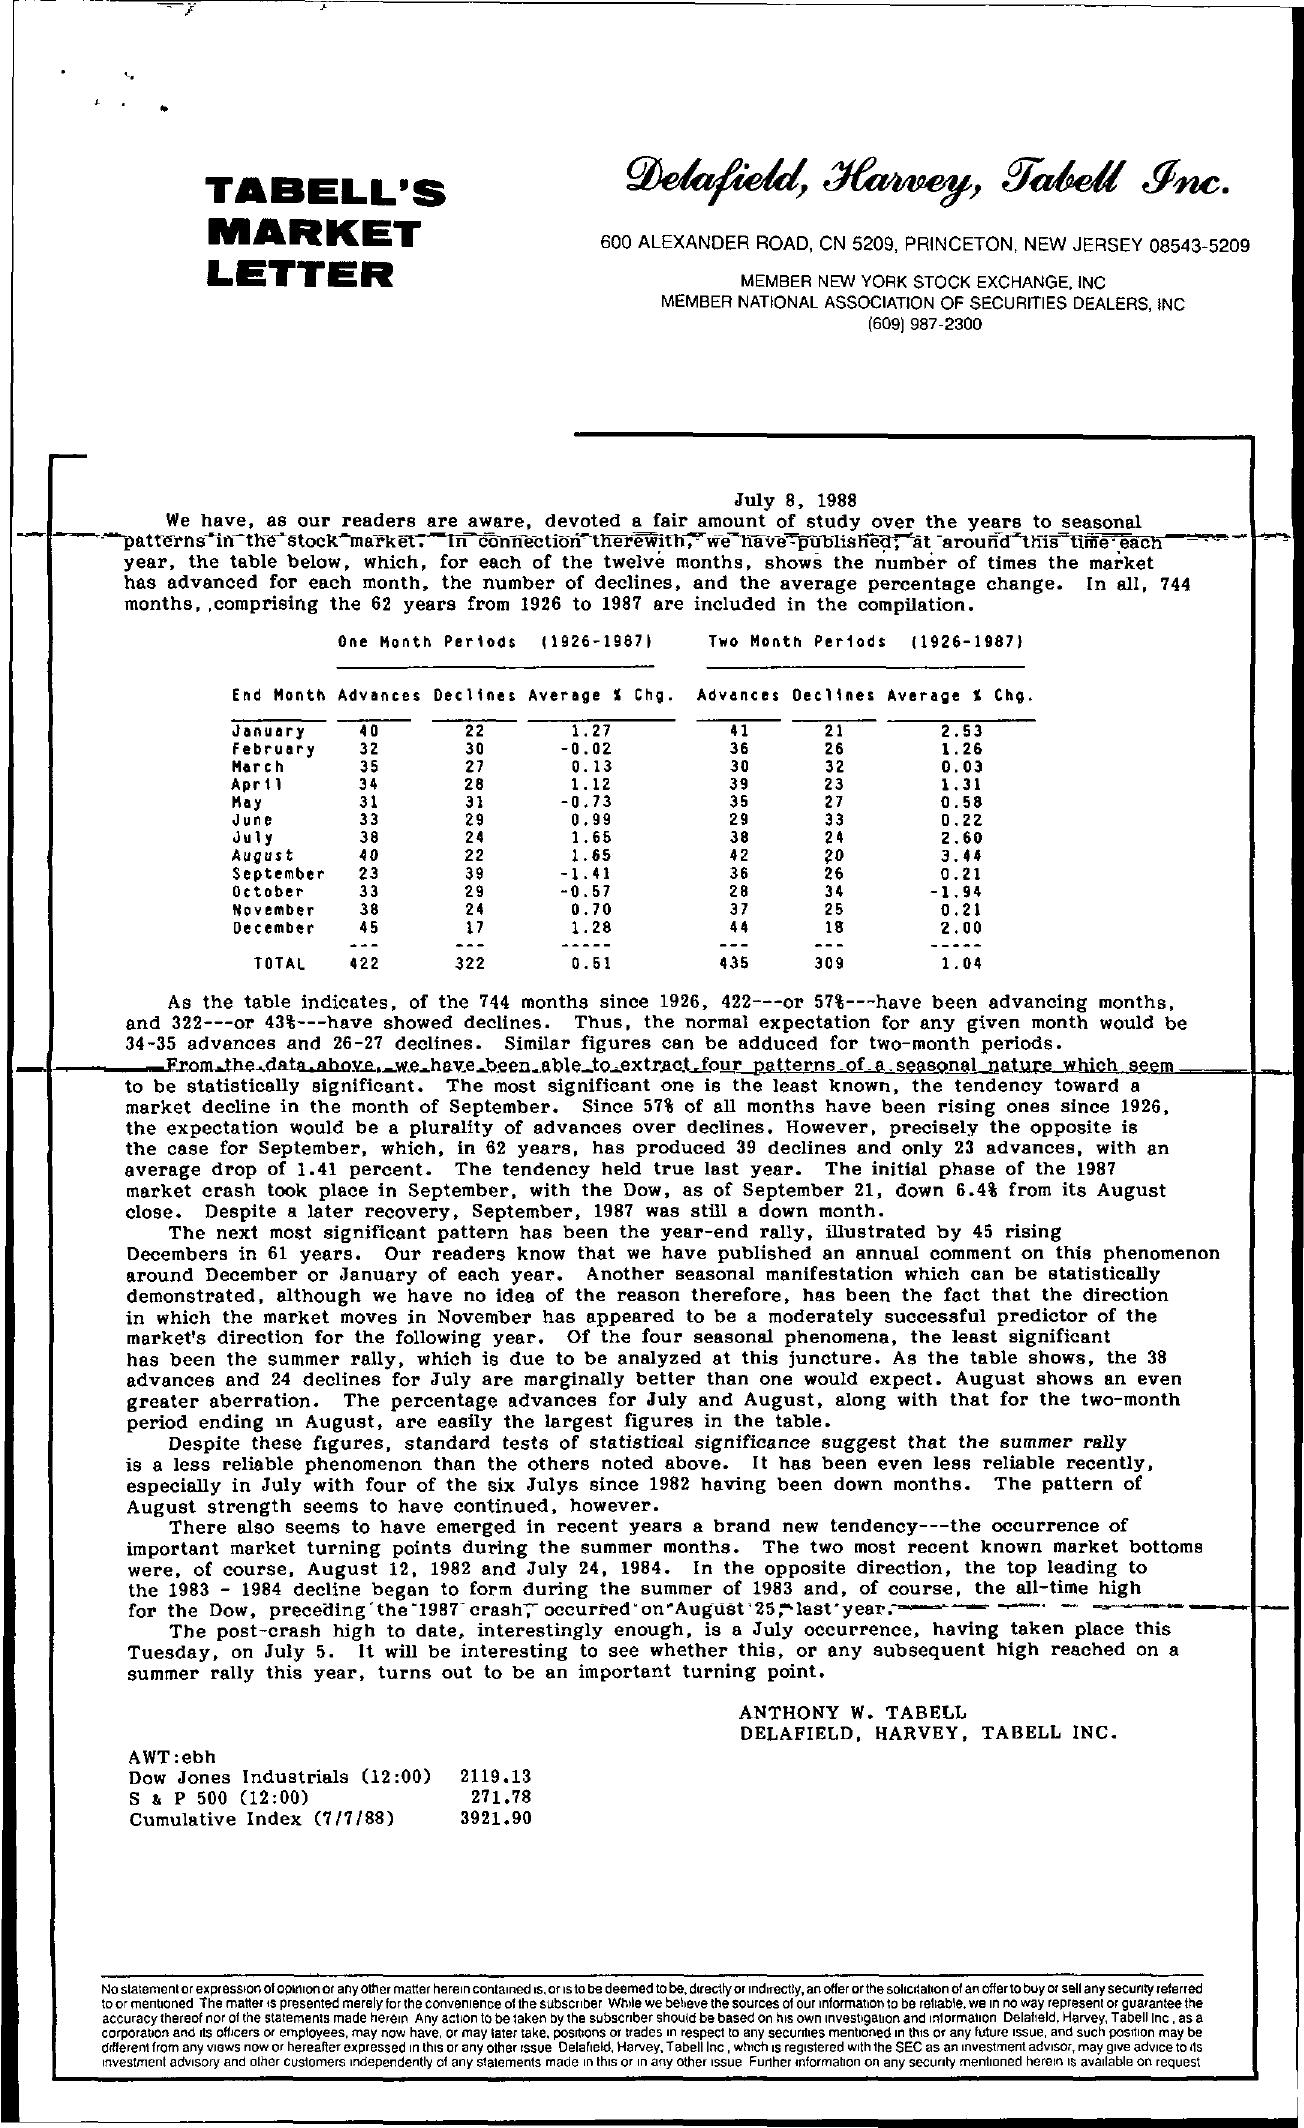 Tabell's Market Letter - July 08, 1988